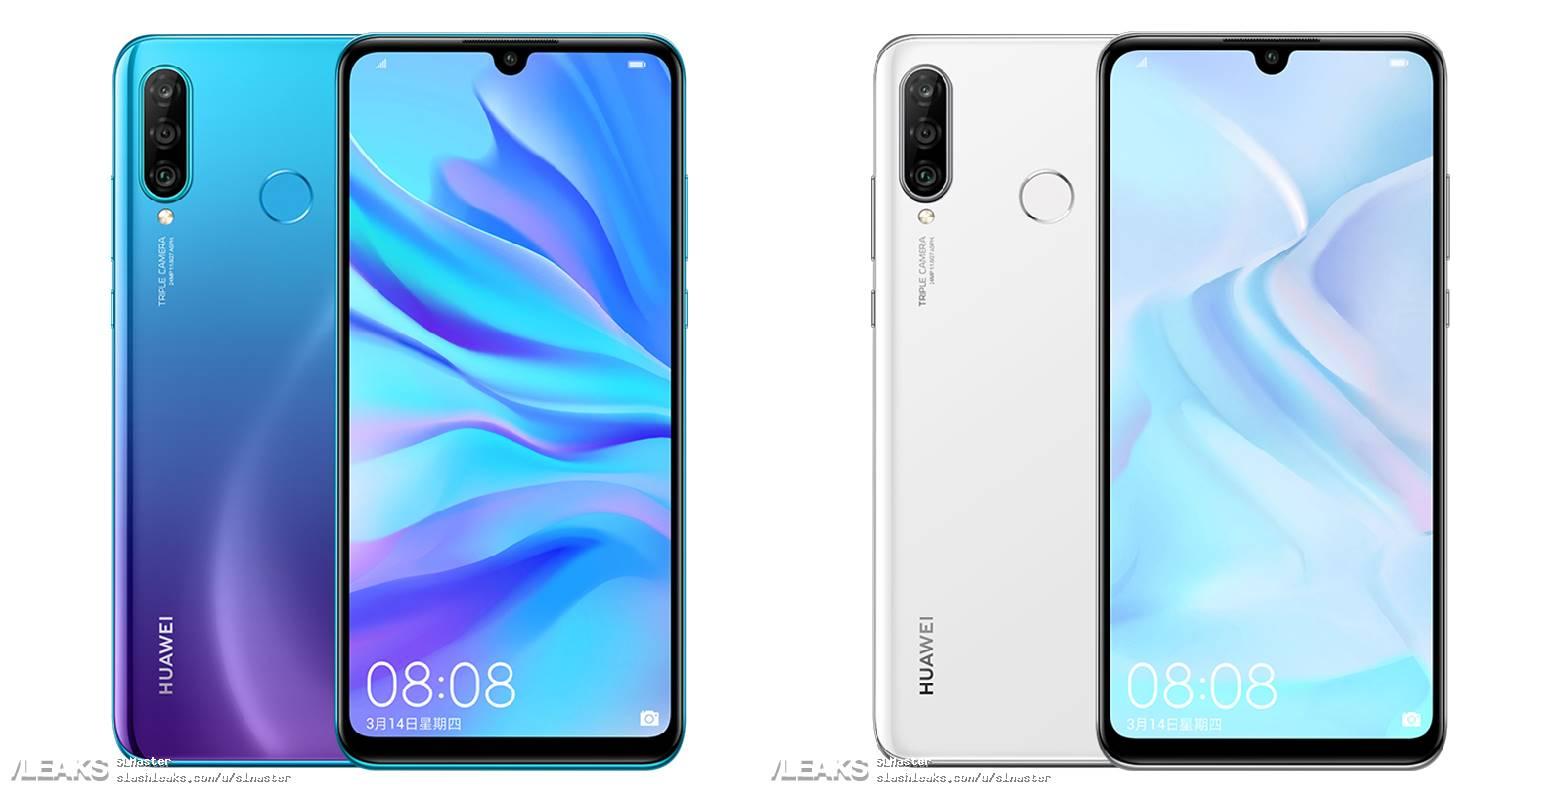 Huawei P30 PRO confirmare lite